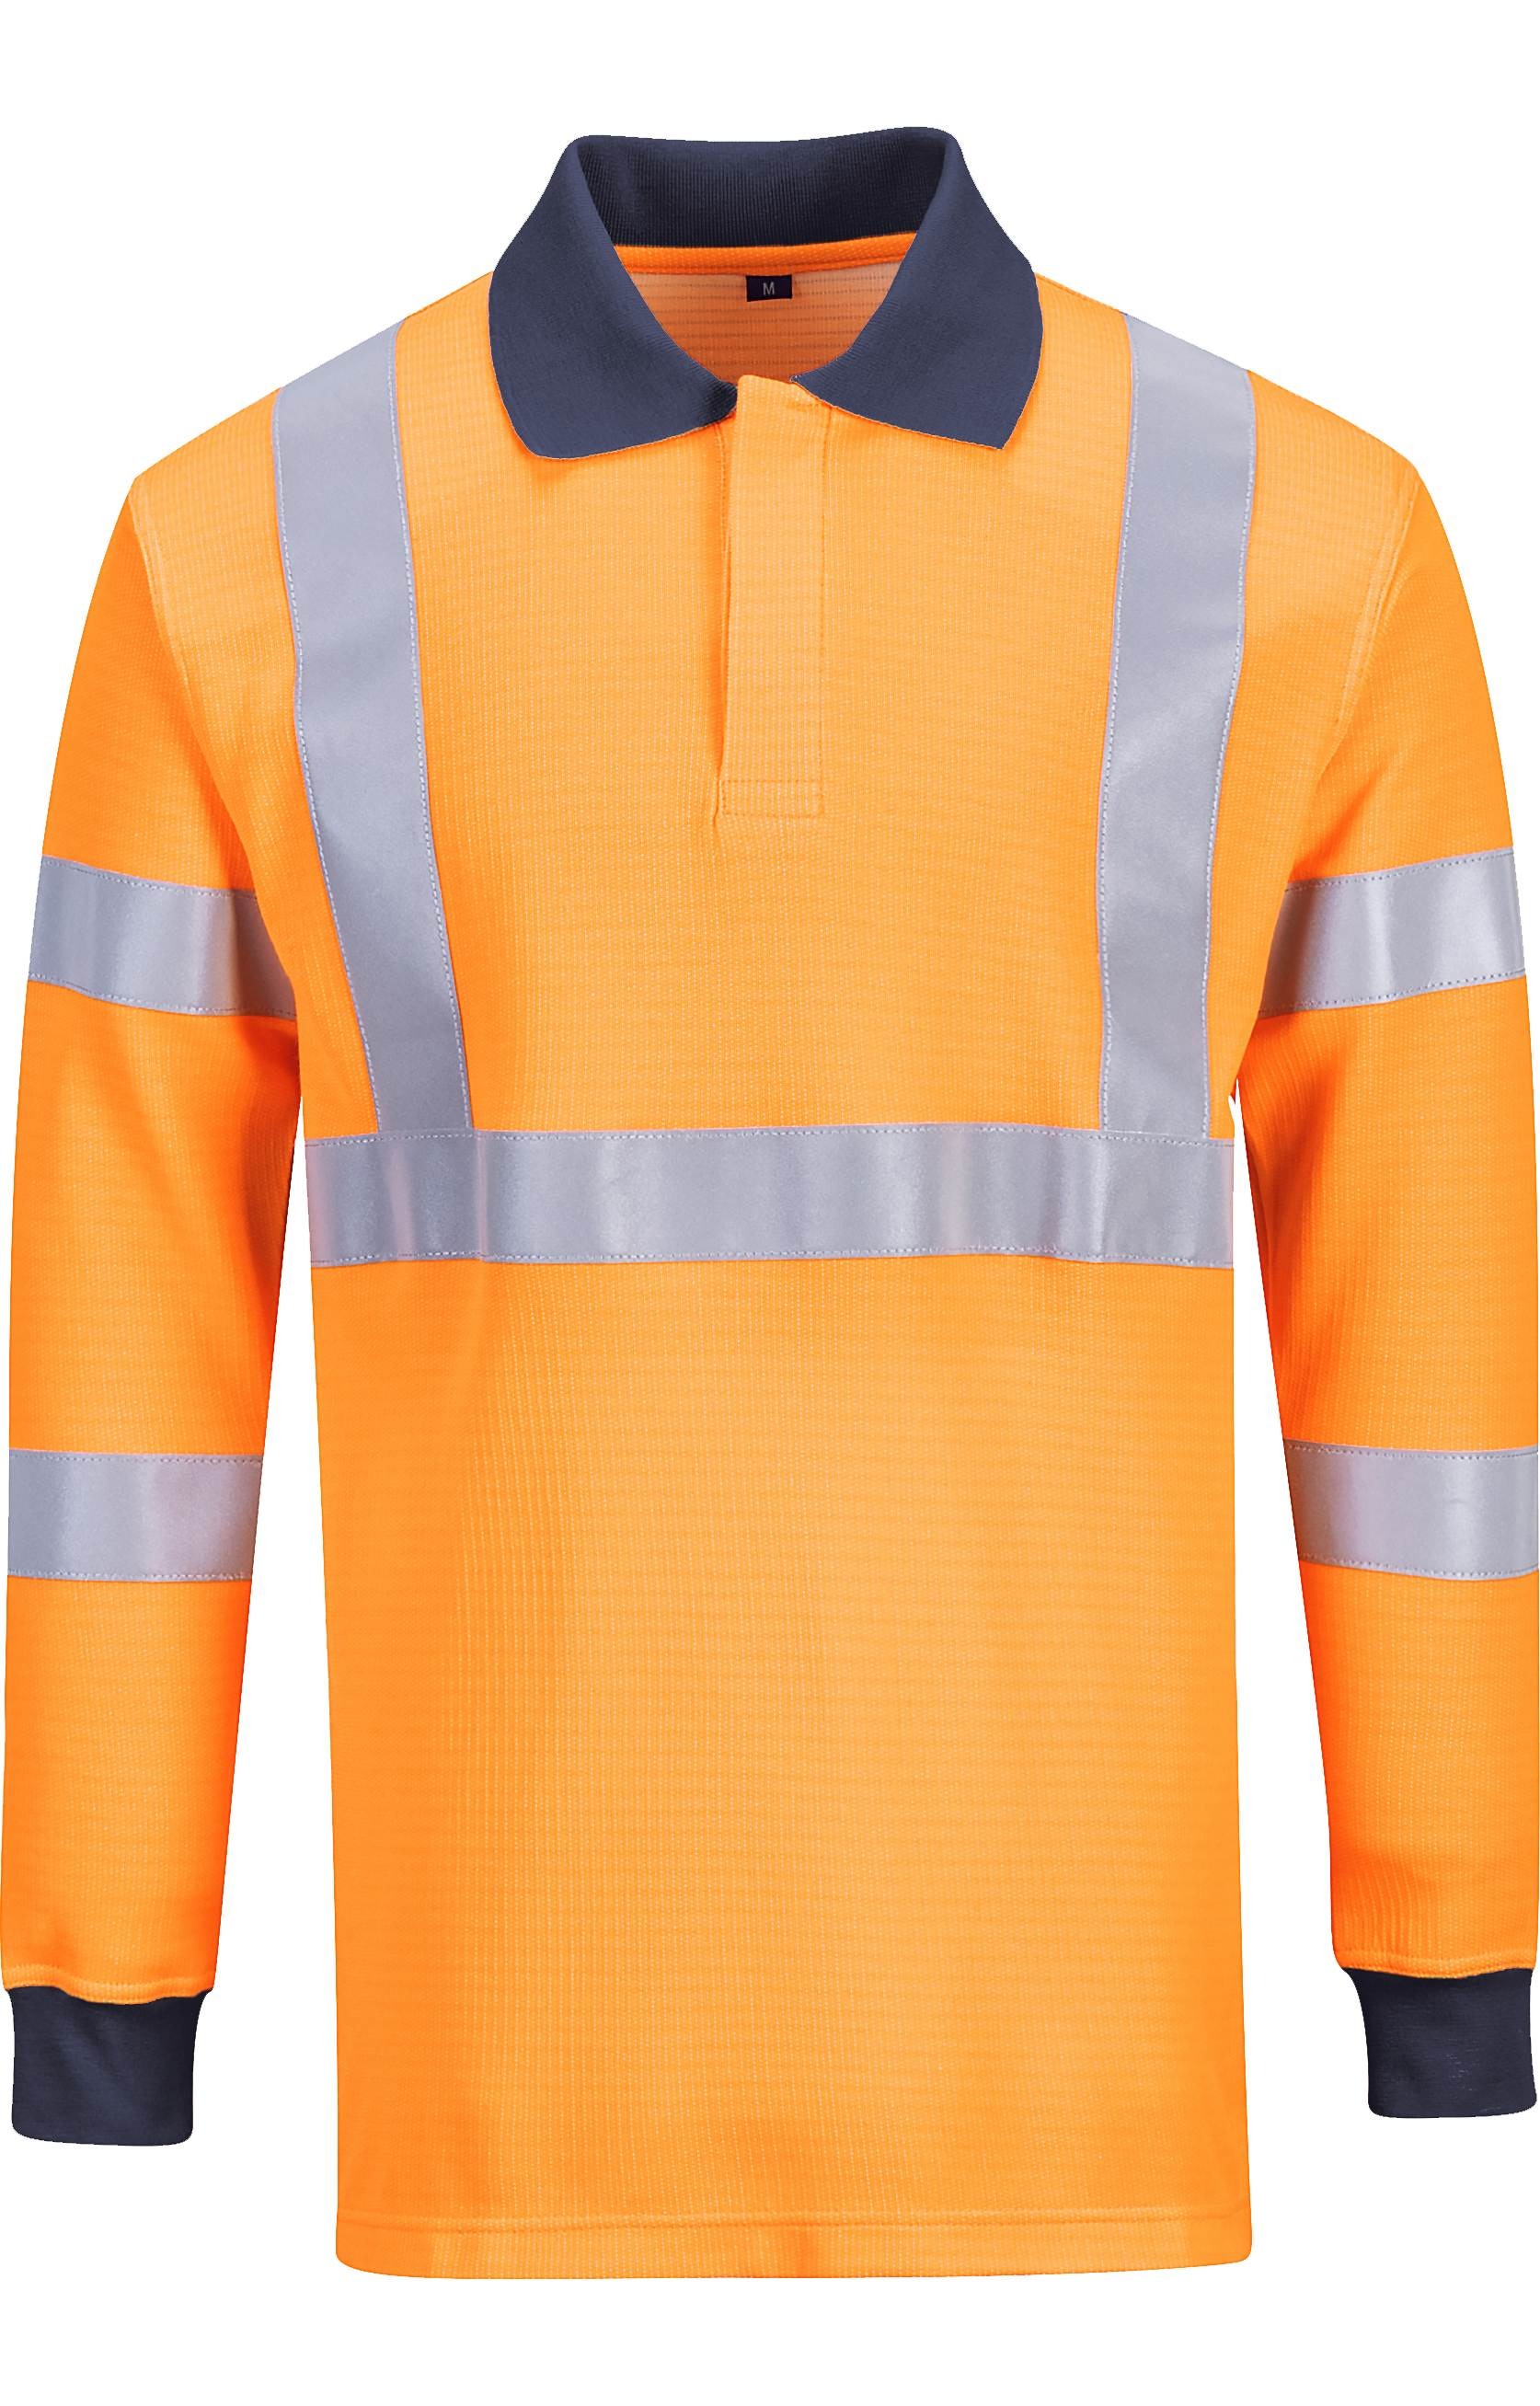 Portwest fr76 men polo shirt flame resistant hi vis for Flame resistant work shirts